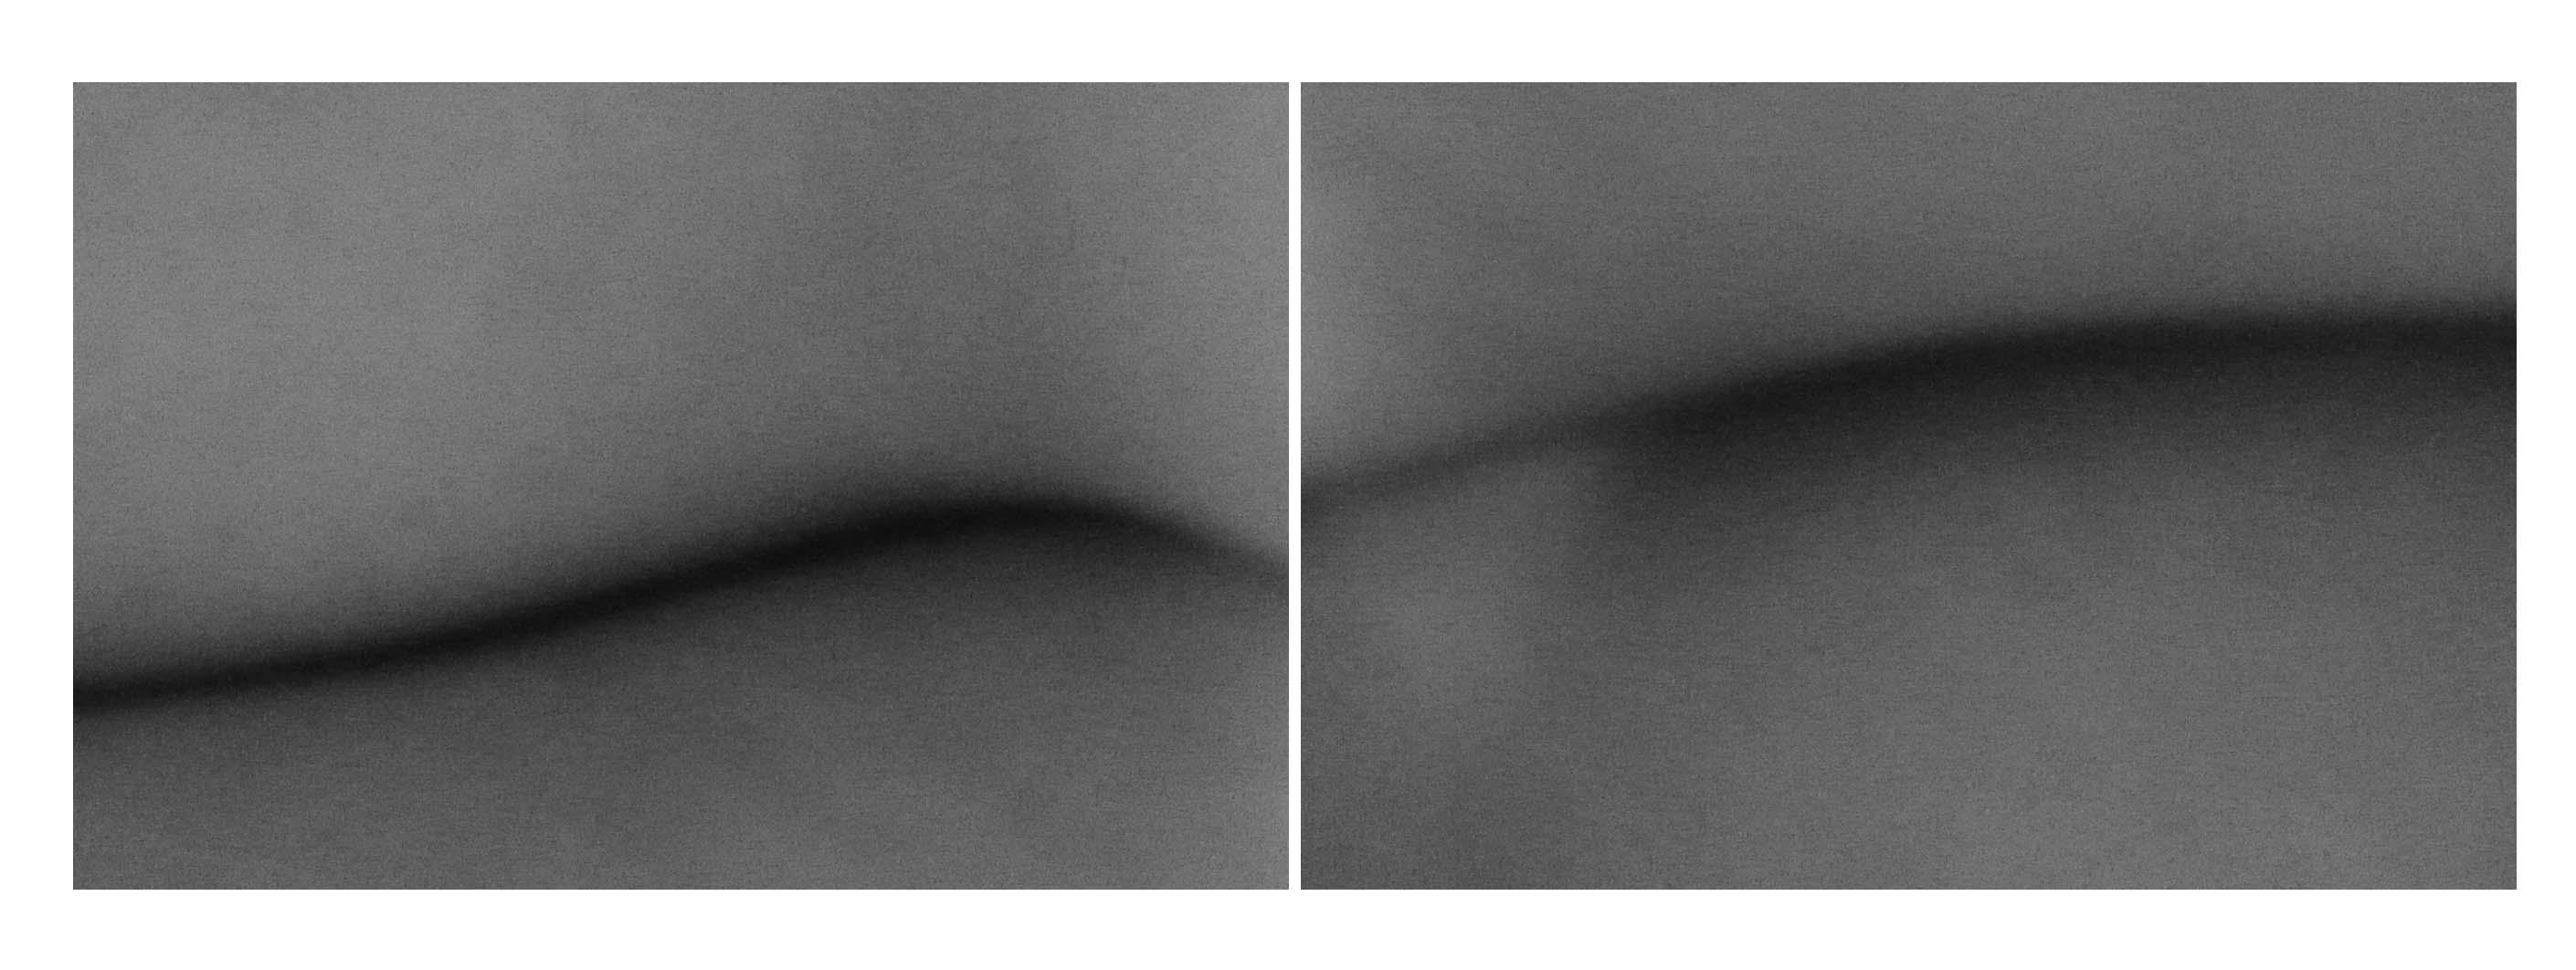 manmeito,Skin line, photography,2012,16